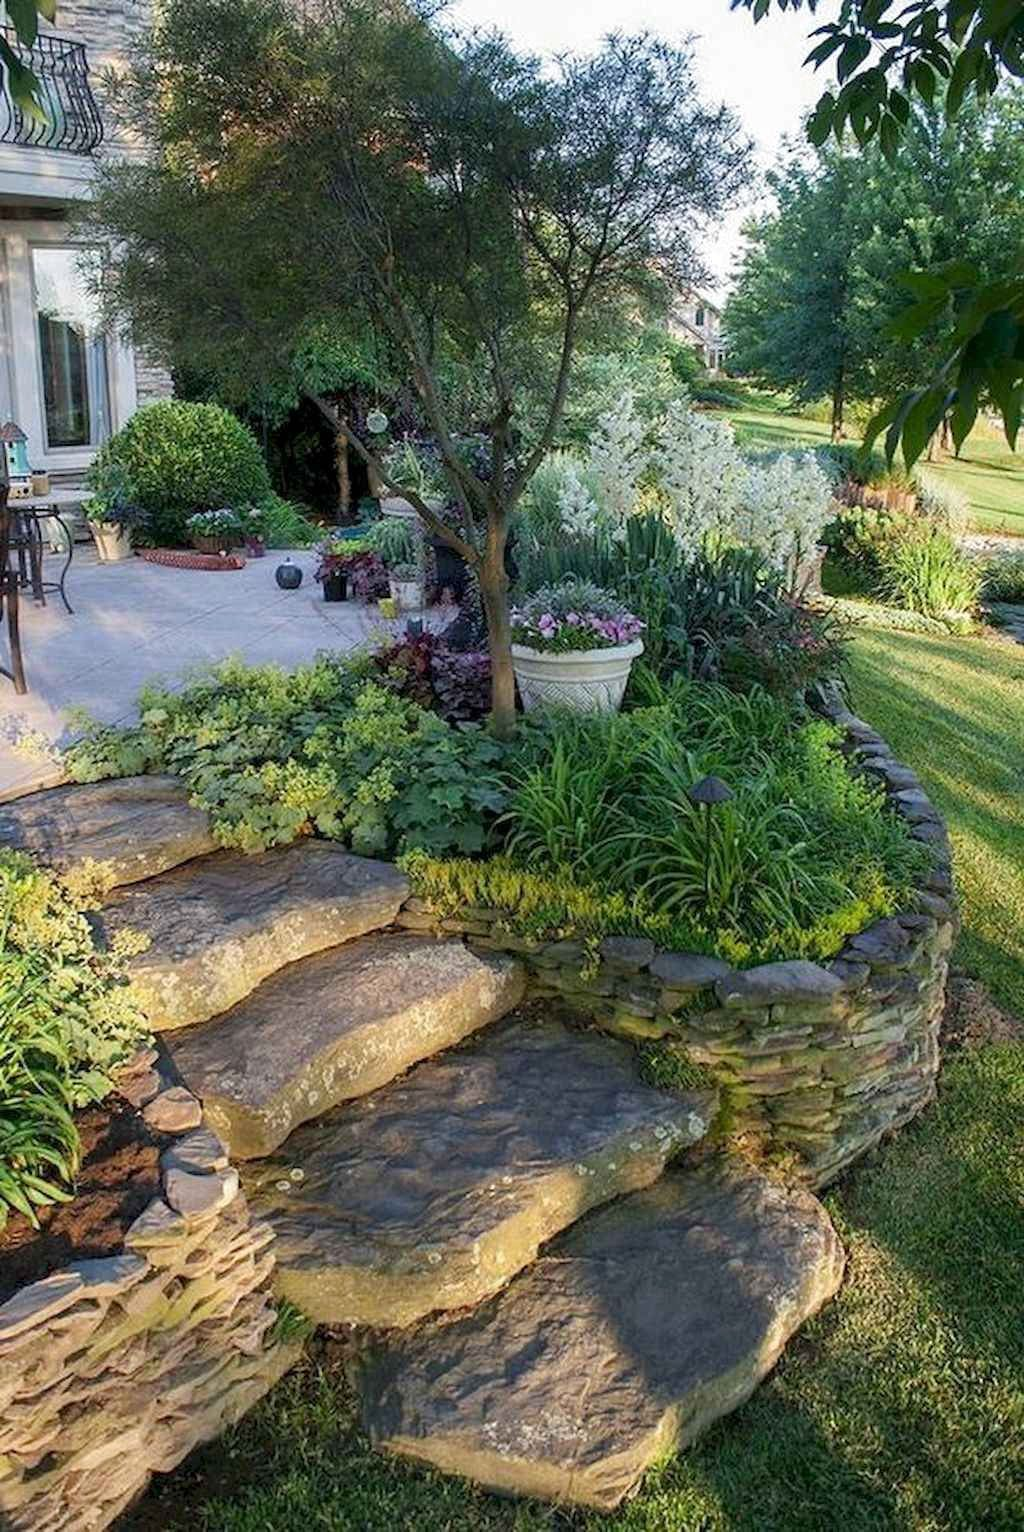 90 Best Side House Garden Landscaping Decoration Ideas With Rocks Front Garden Design Garden Stairs Rock Garden Landscaping